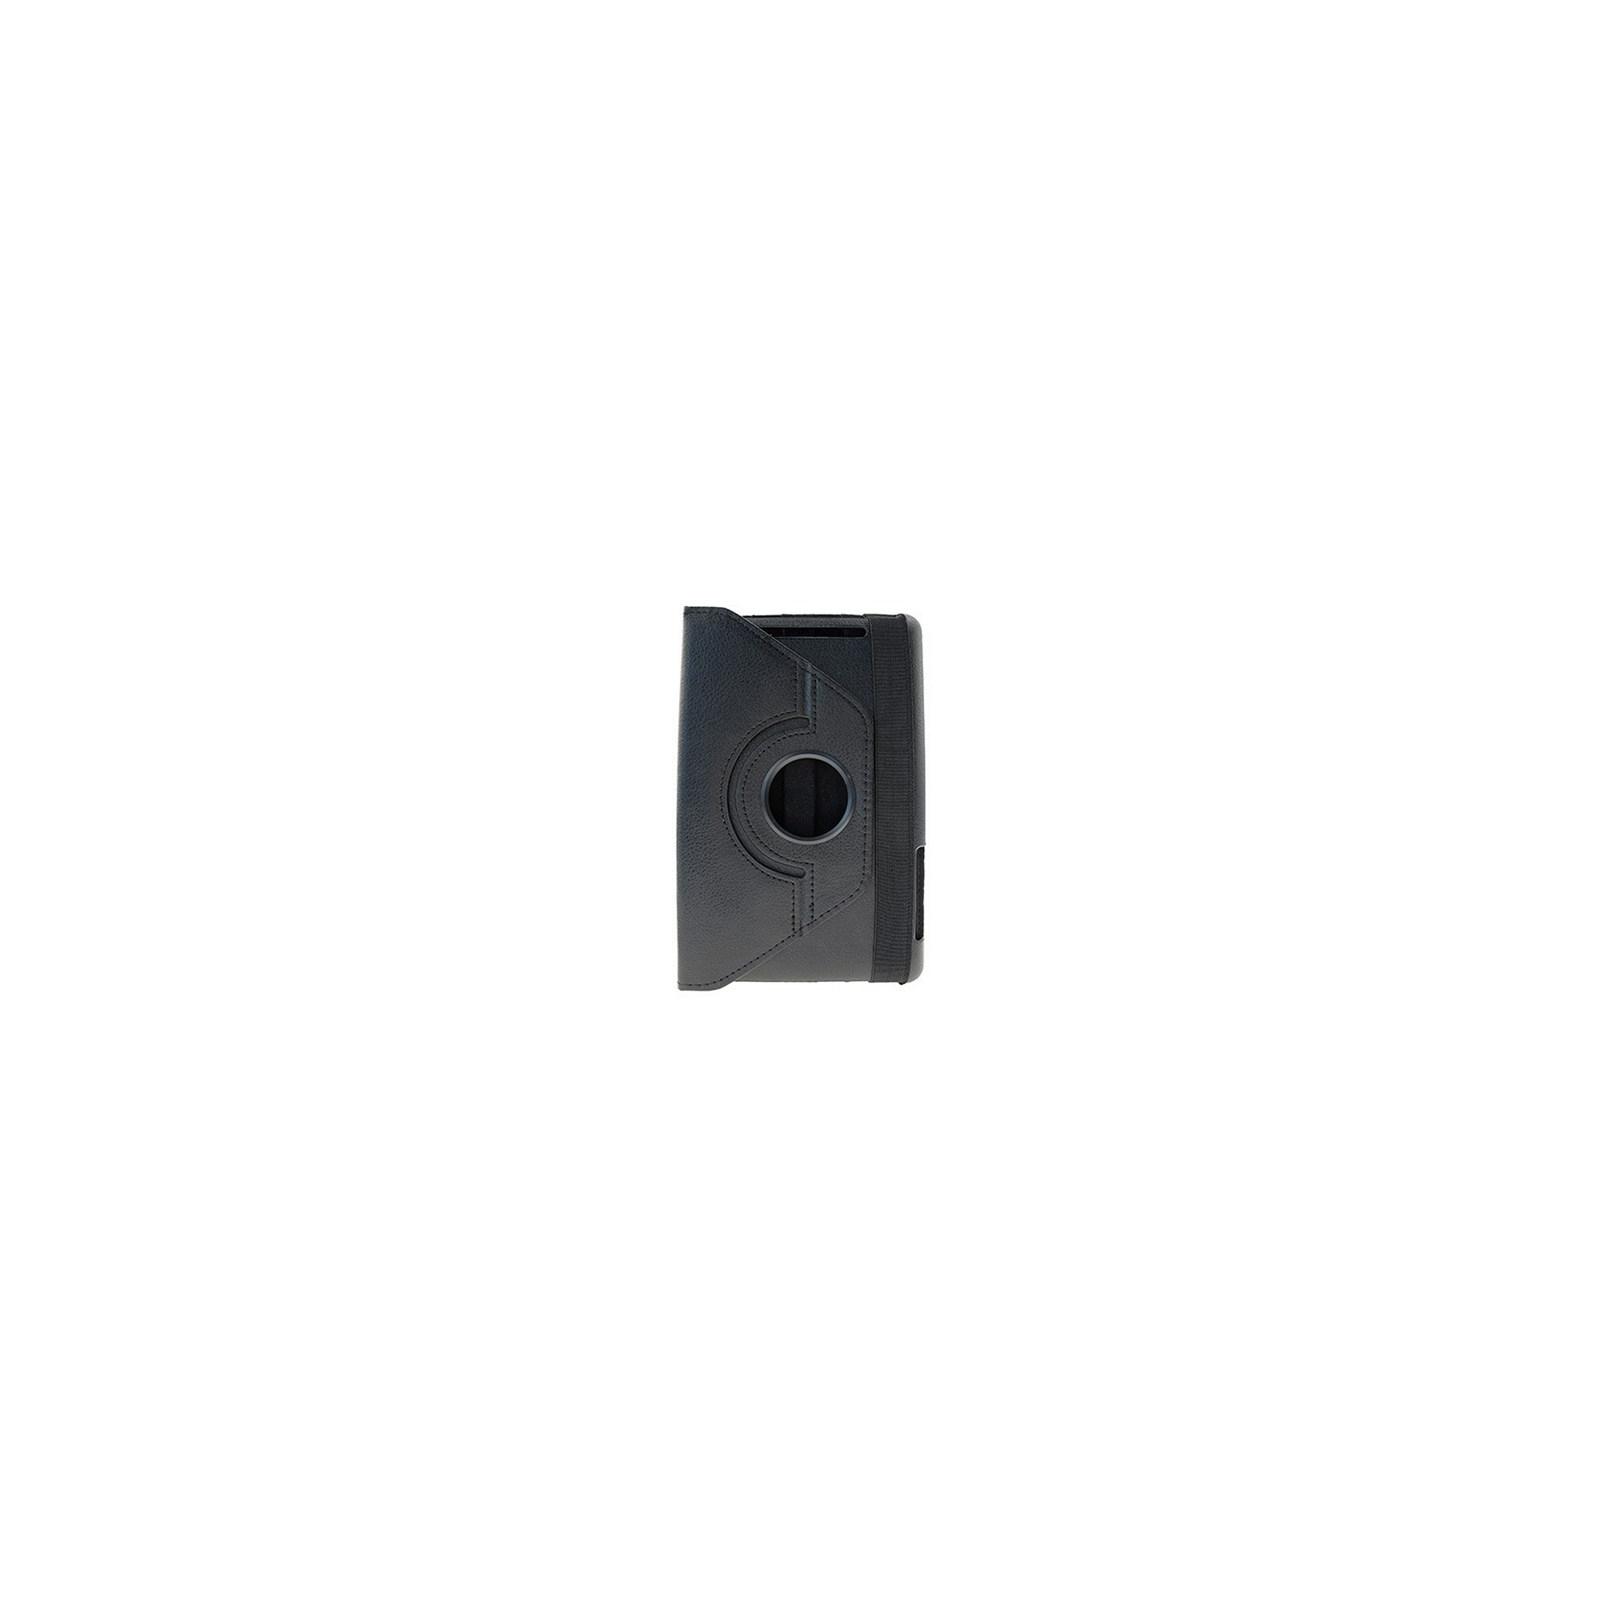 Чехол для планшета Drobak 7 Asus Nexus /Black/ ротатор (210310)